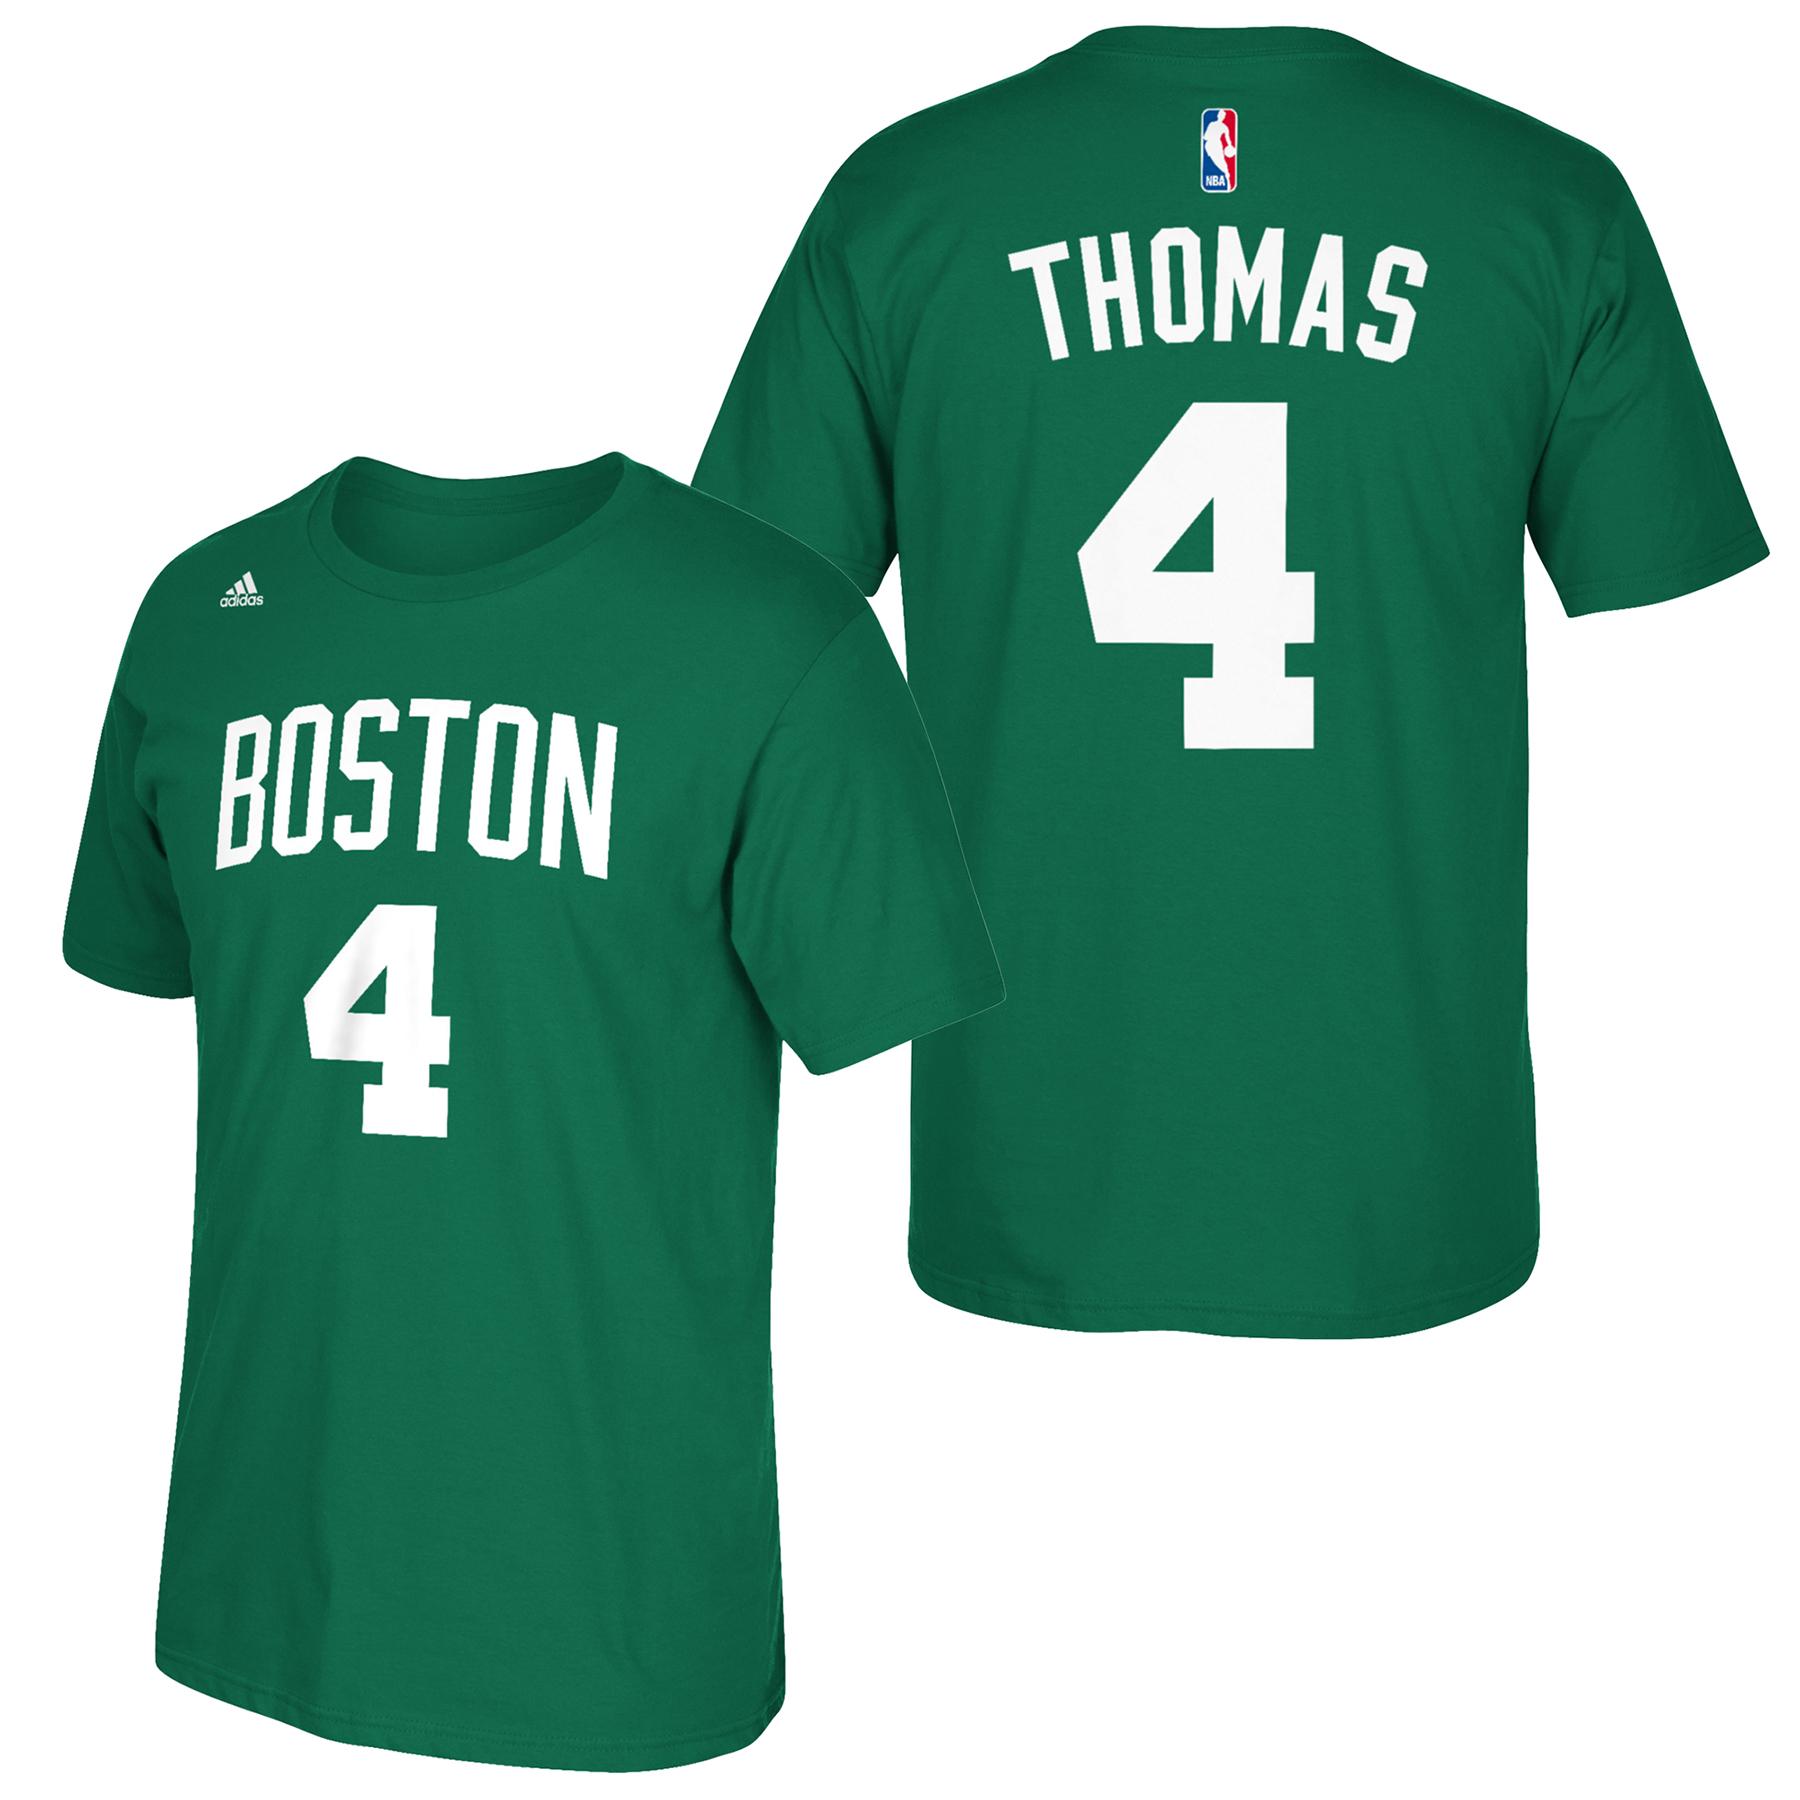 Boston Celtics adidas Name & Number T-Shirt - Isaiah Thomas